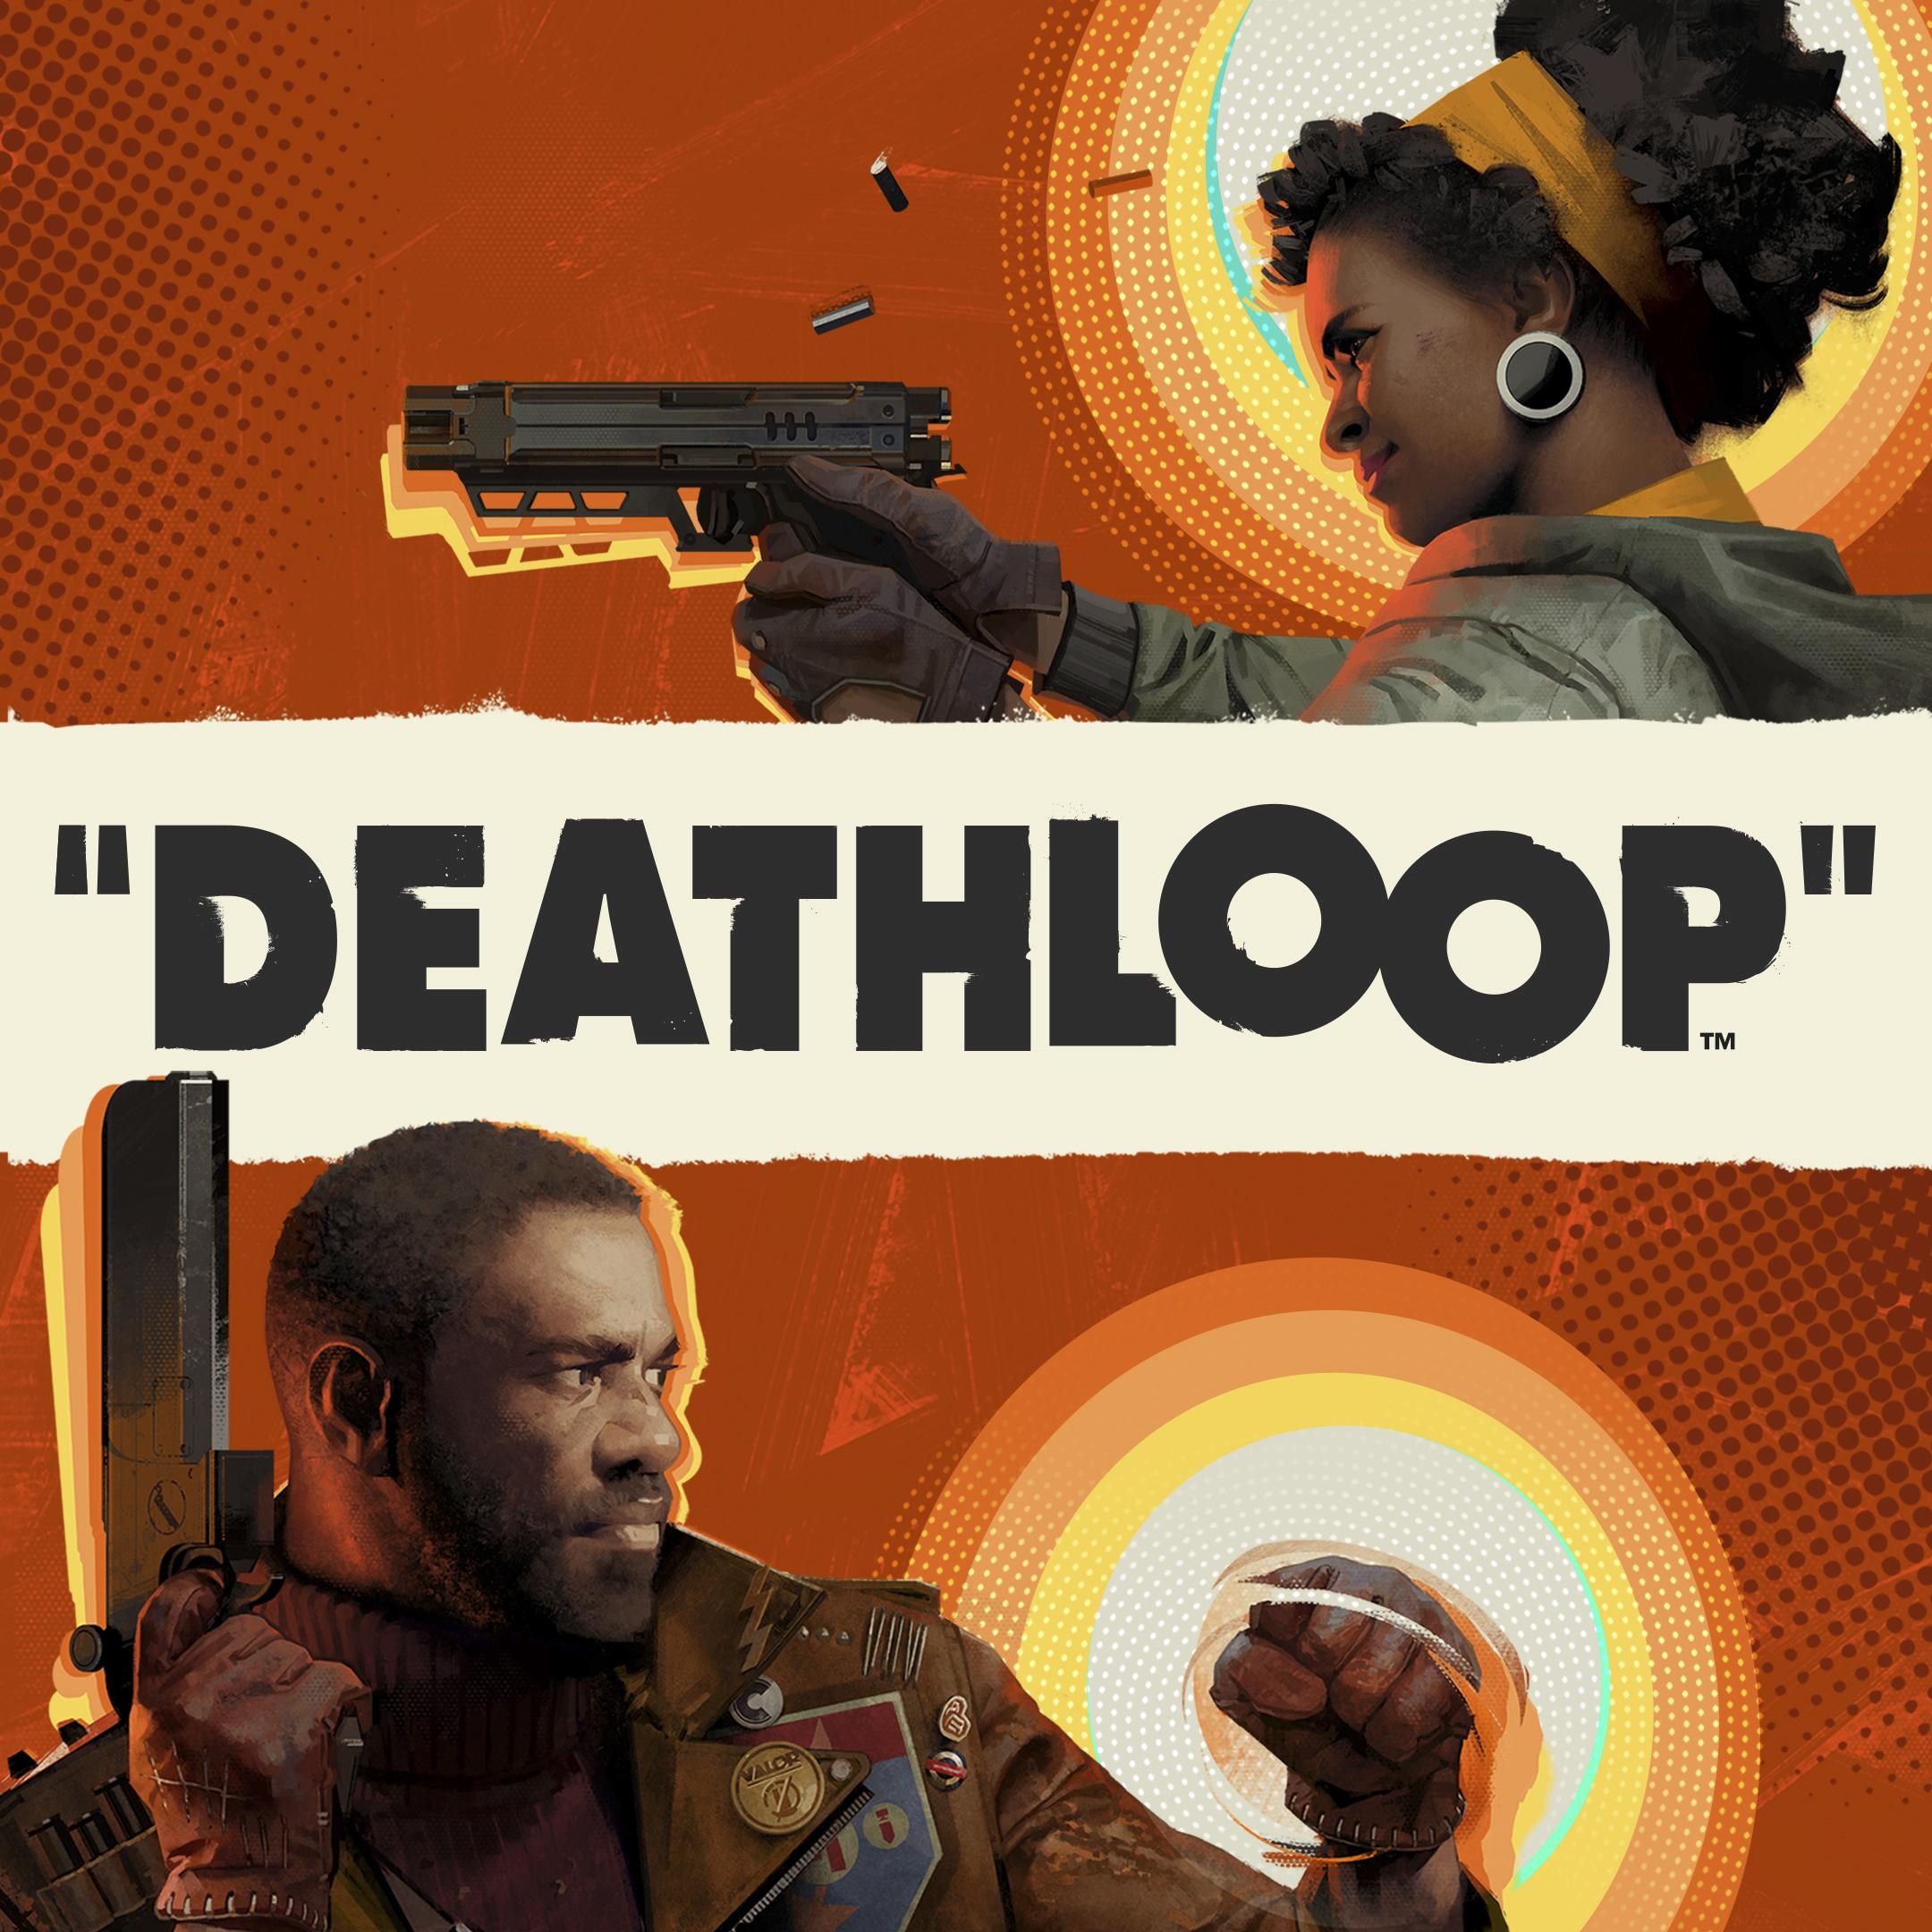 Deathloop – Kaupan kuvitus